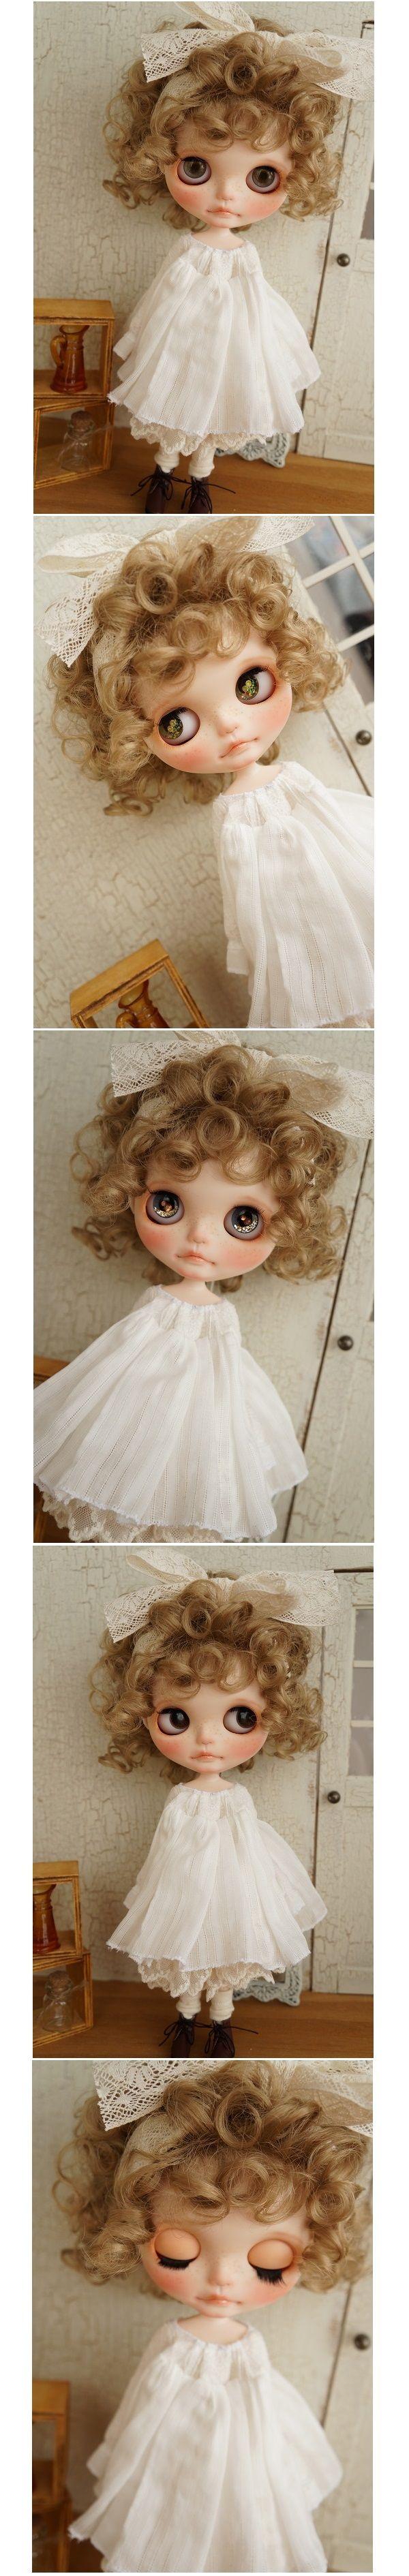 *** Custom Blythe *** Custom Blythe *** white dress of girl *** Admin - Auction - Rinkya! Japan Auction & Shopping